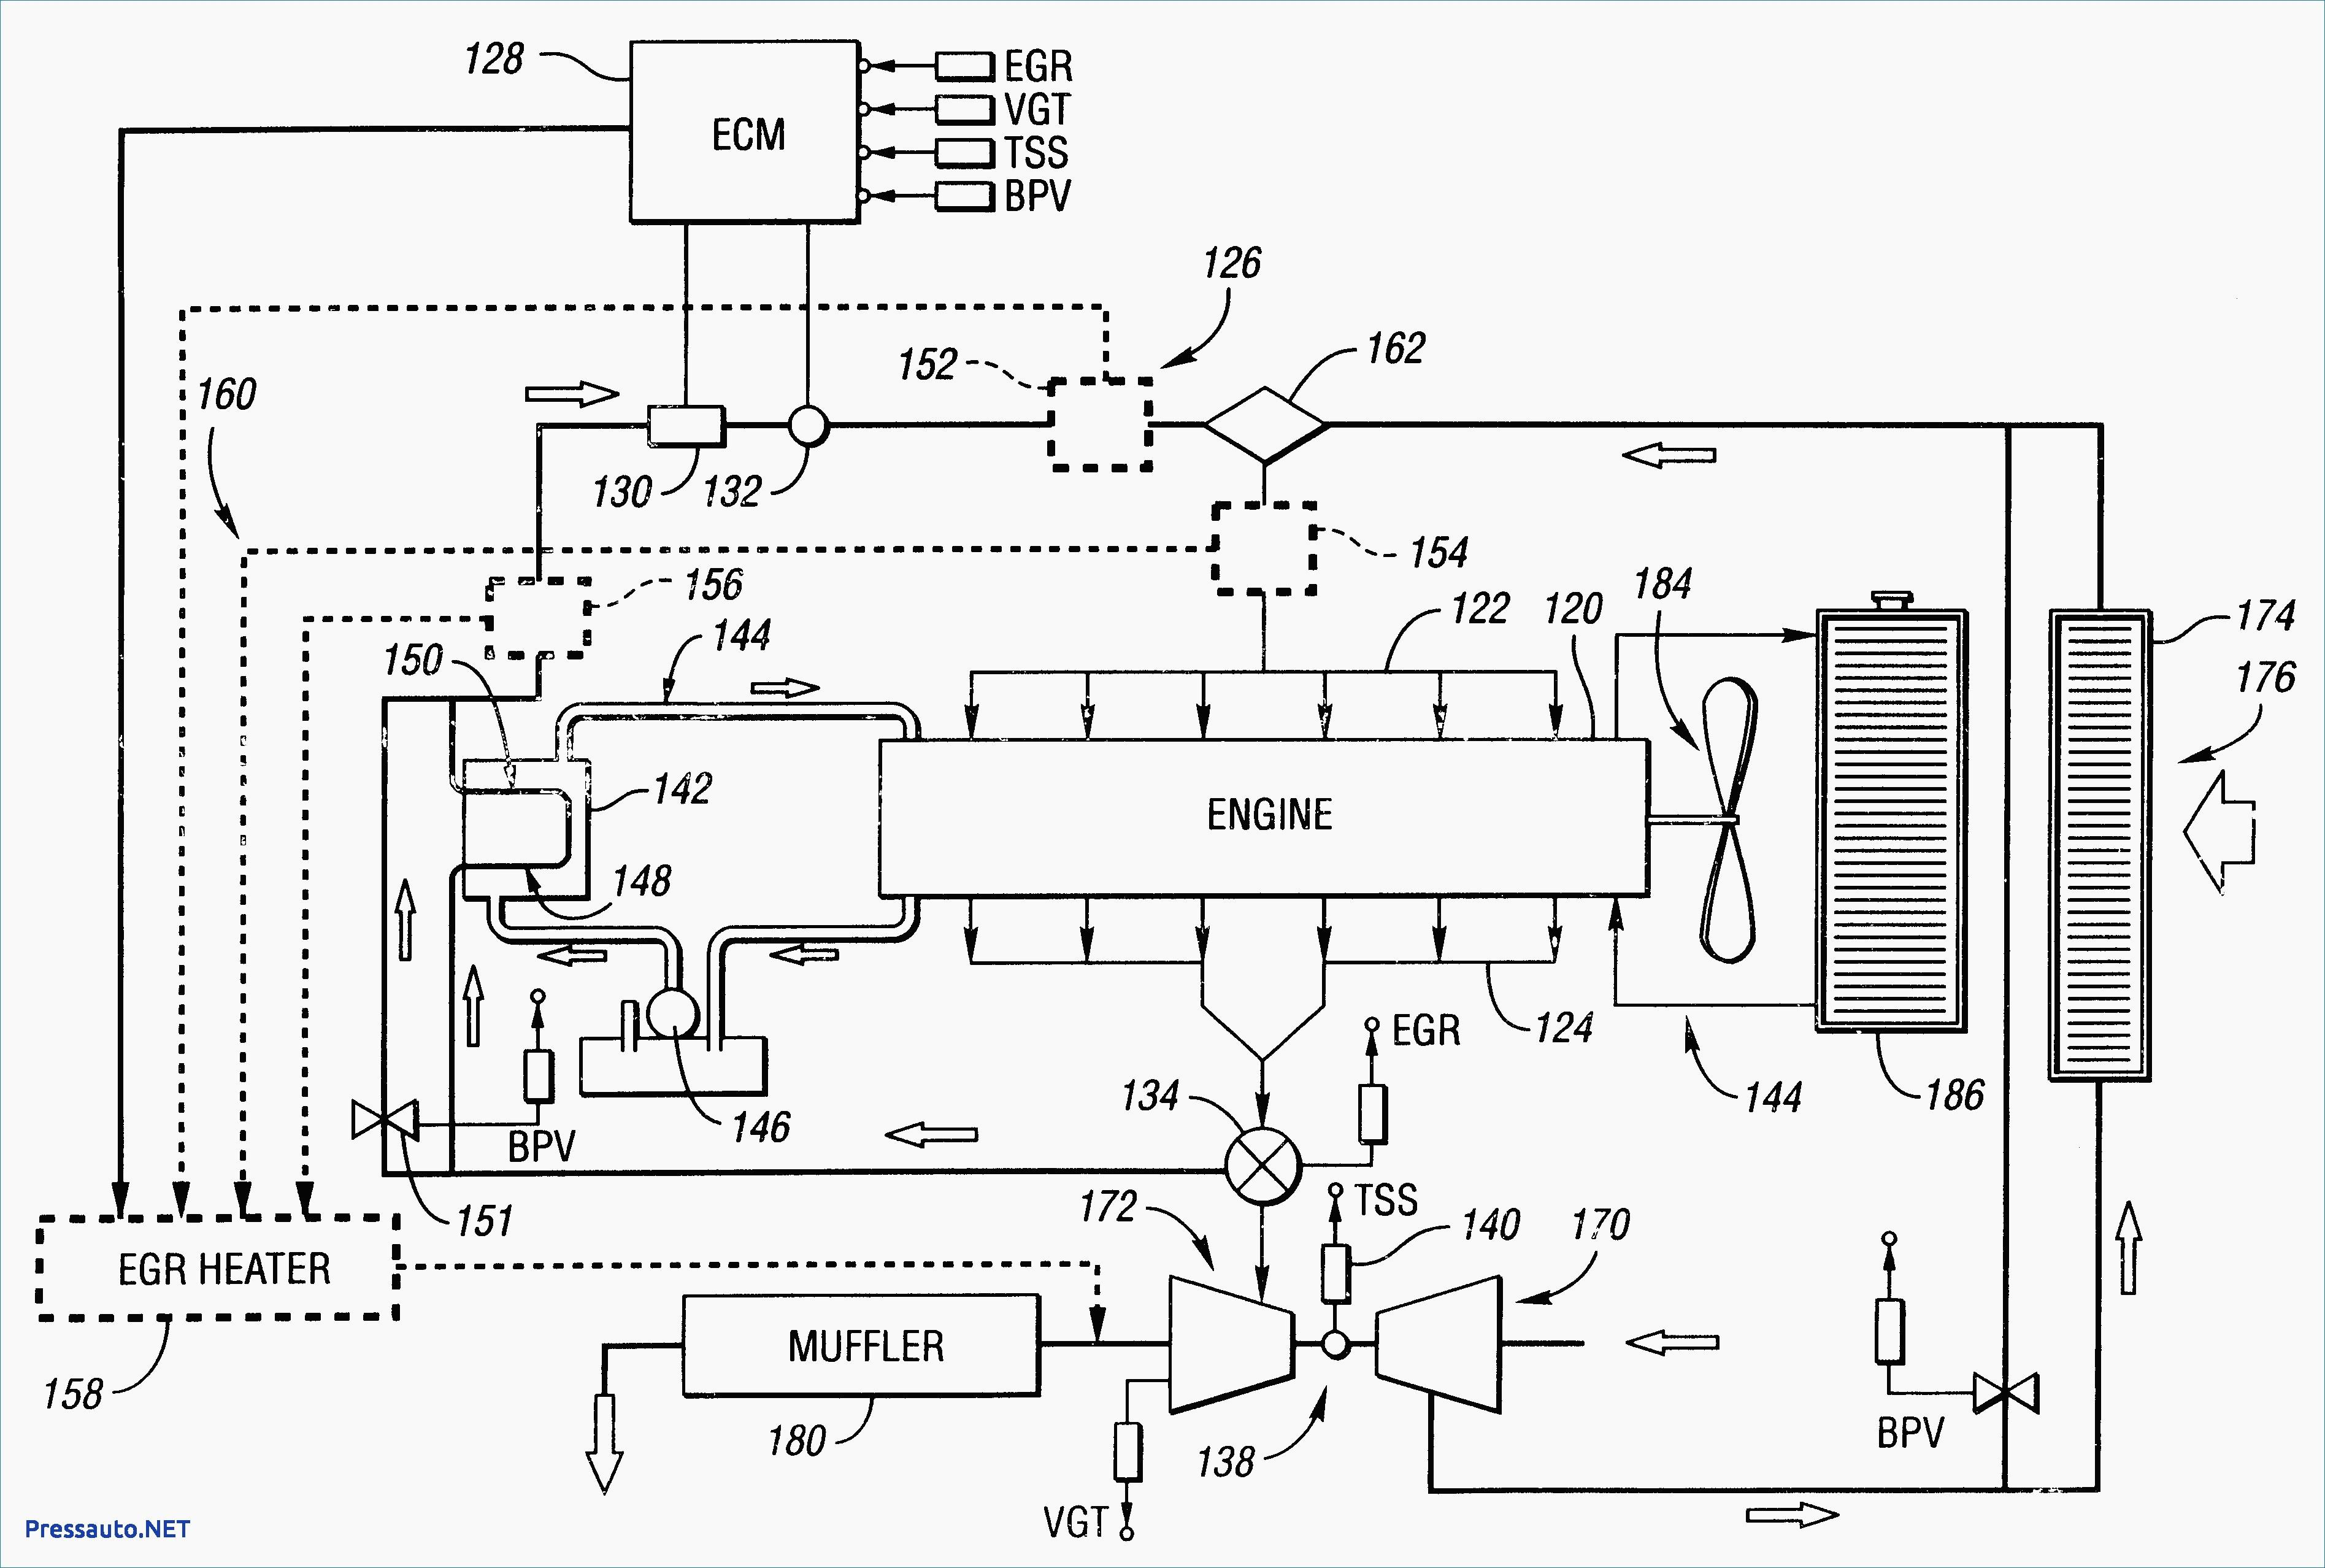 trane rooftop unit wiring diagram Download-Luxury Trane Rooftop Unit Wiring Diagram ponent 7-l